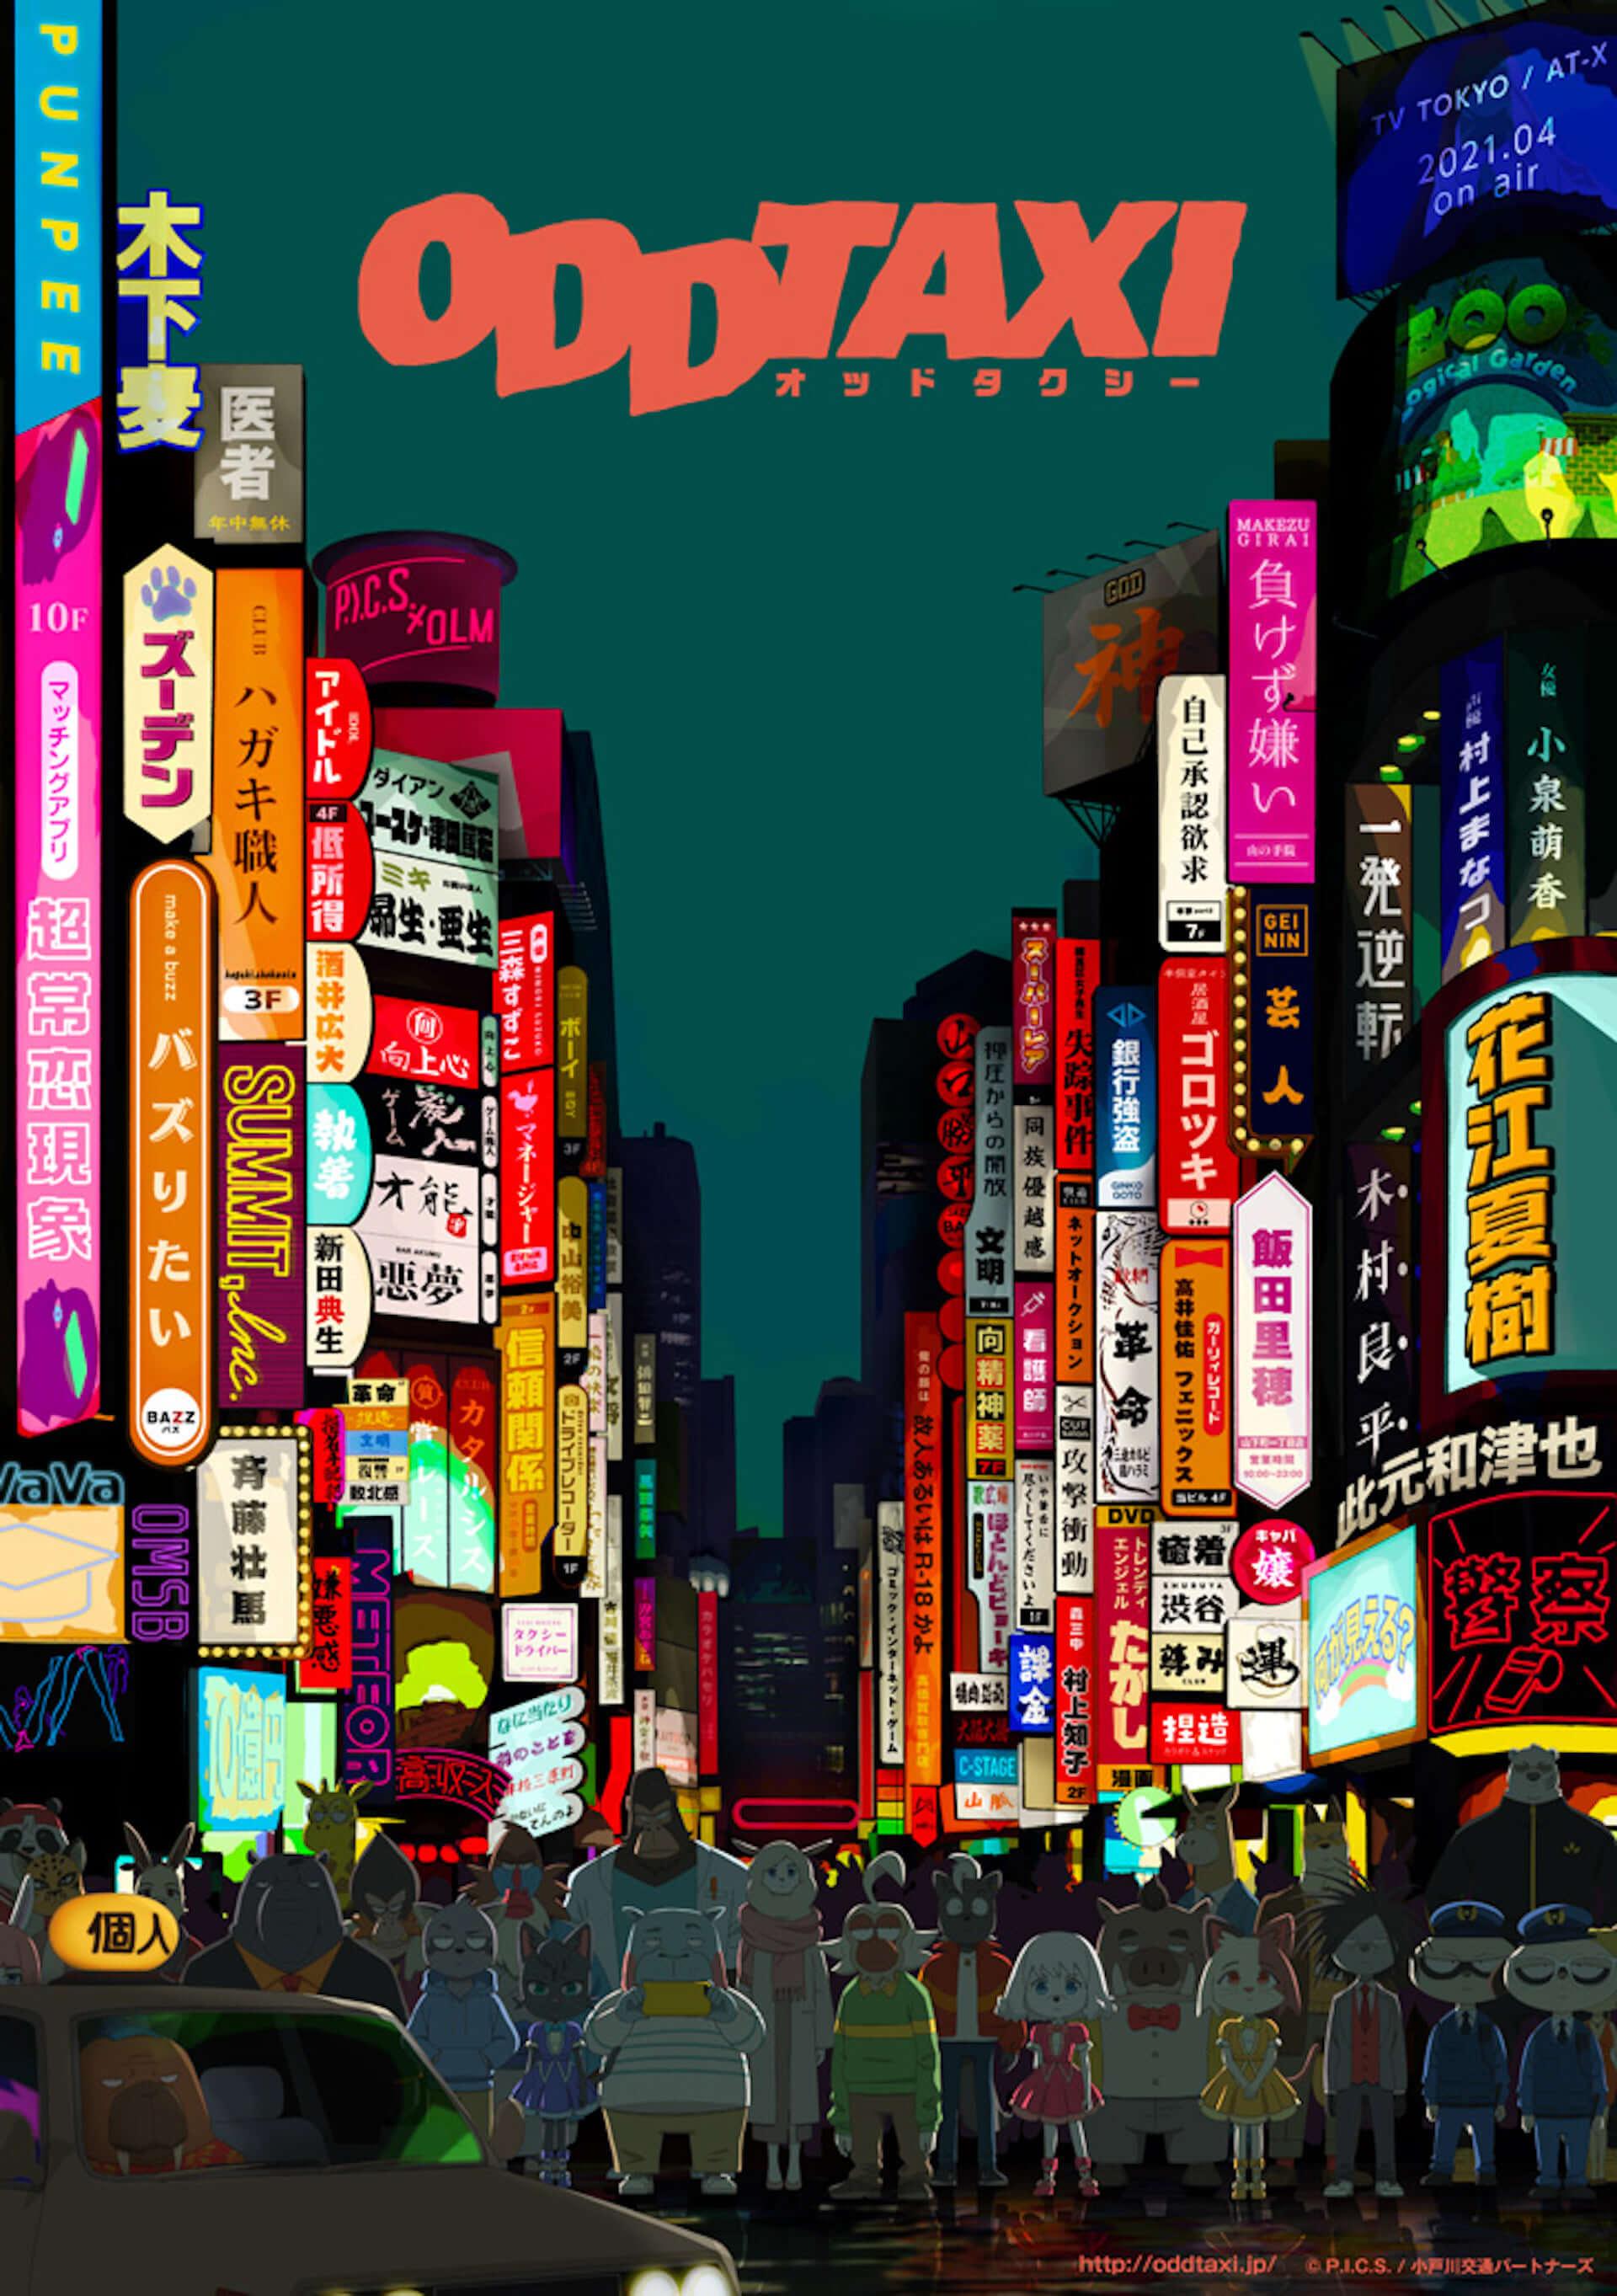 PUNPEE、VaVa、OMSBらが音楽を担当した花江夏樹主演アニメ『オッドタクシー』のPV第2弾が公開!先行上映会も開催決定 art210219_oddtaxi_2-1920x2726